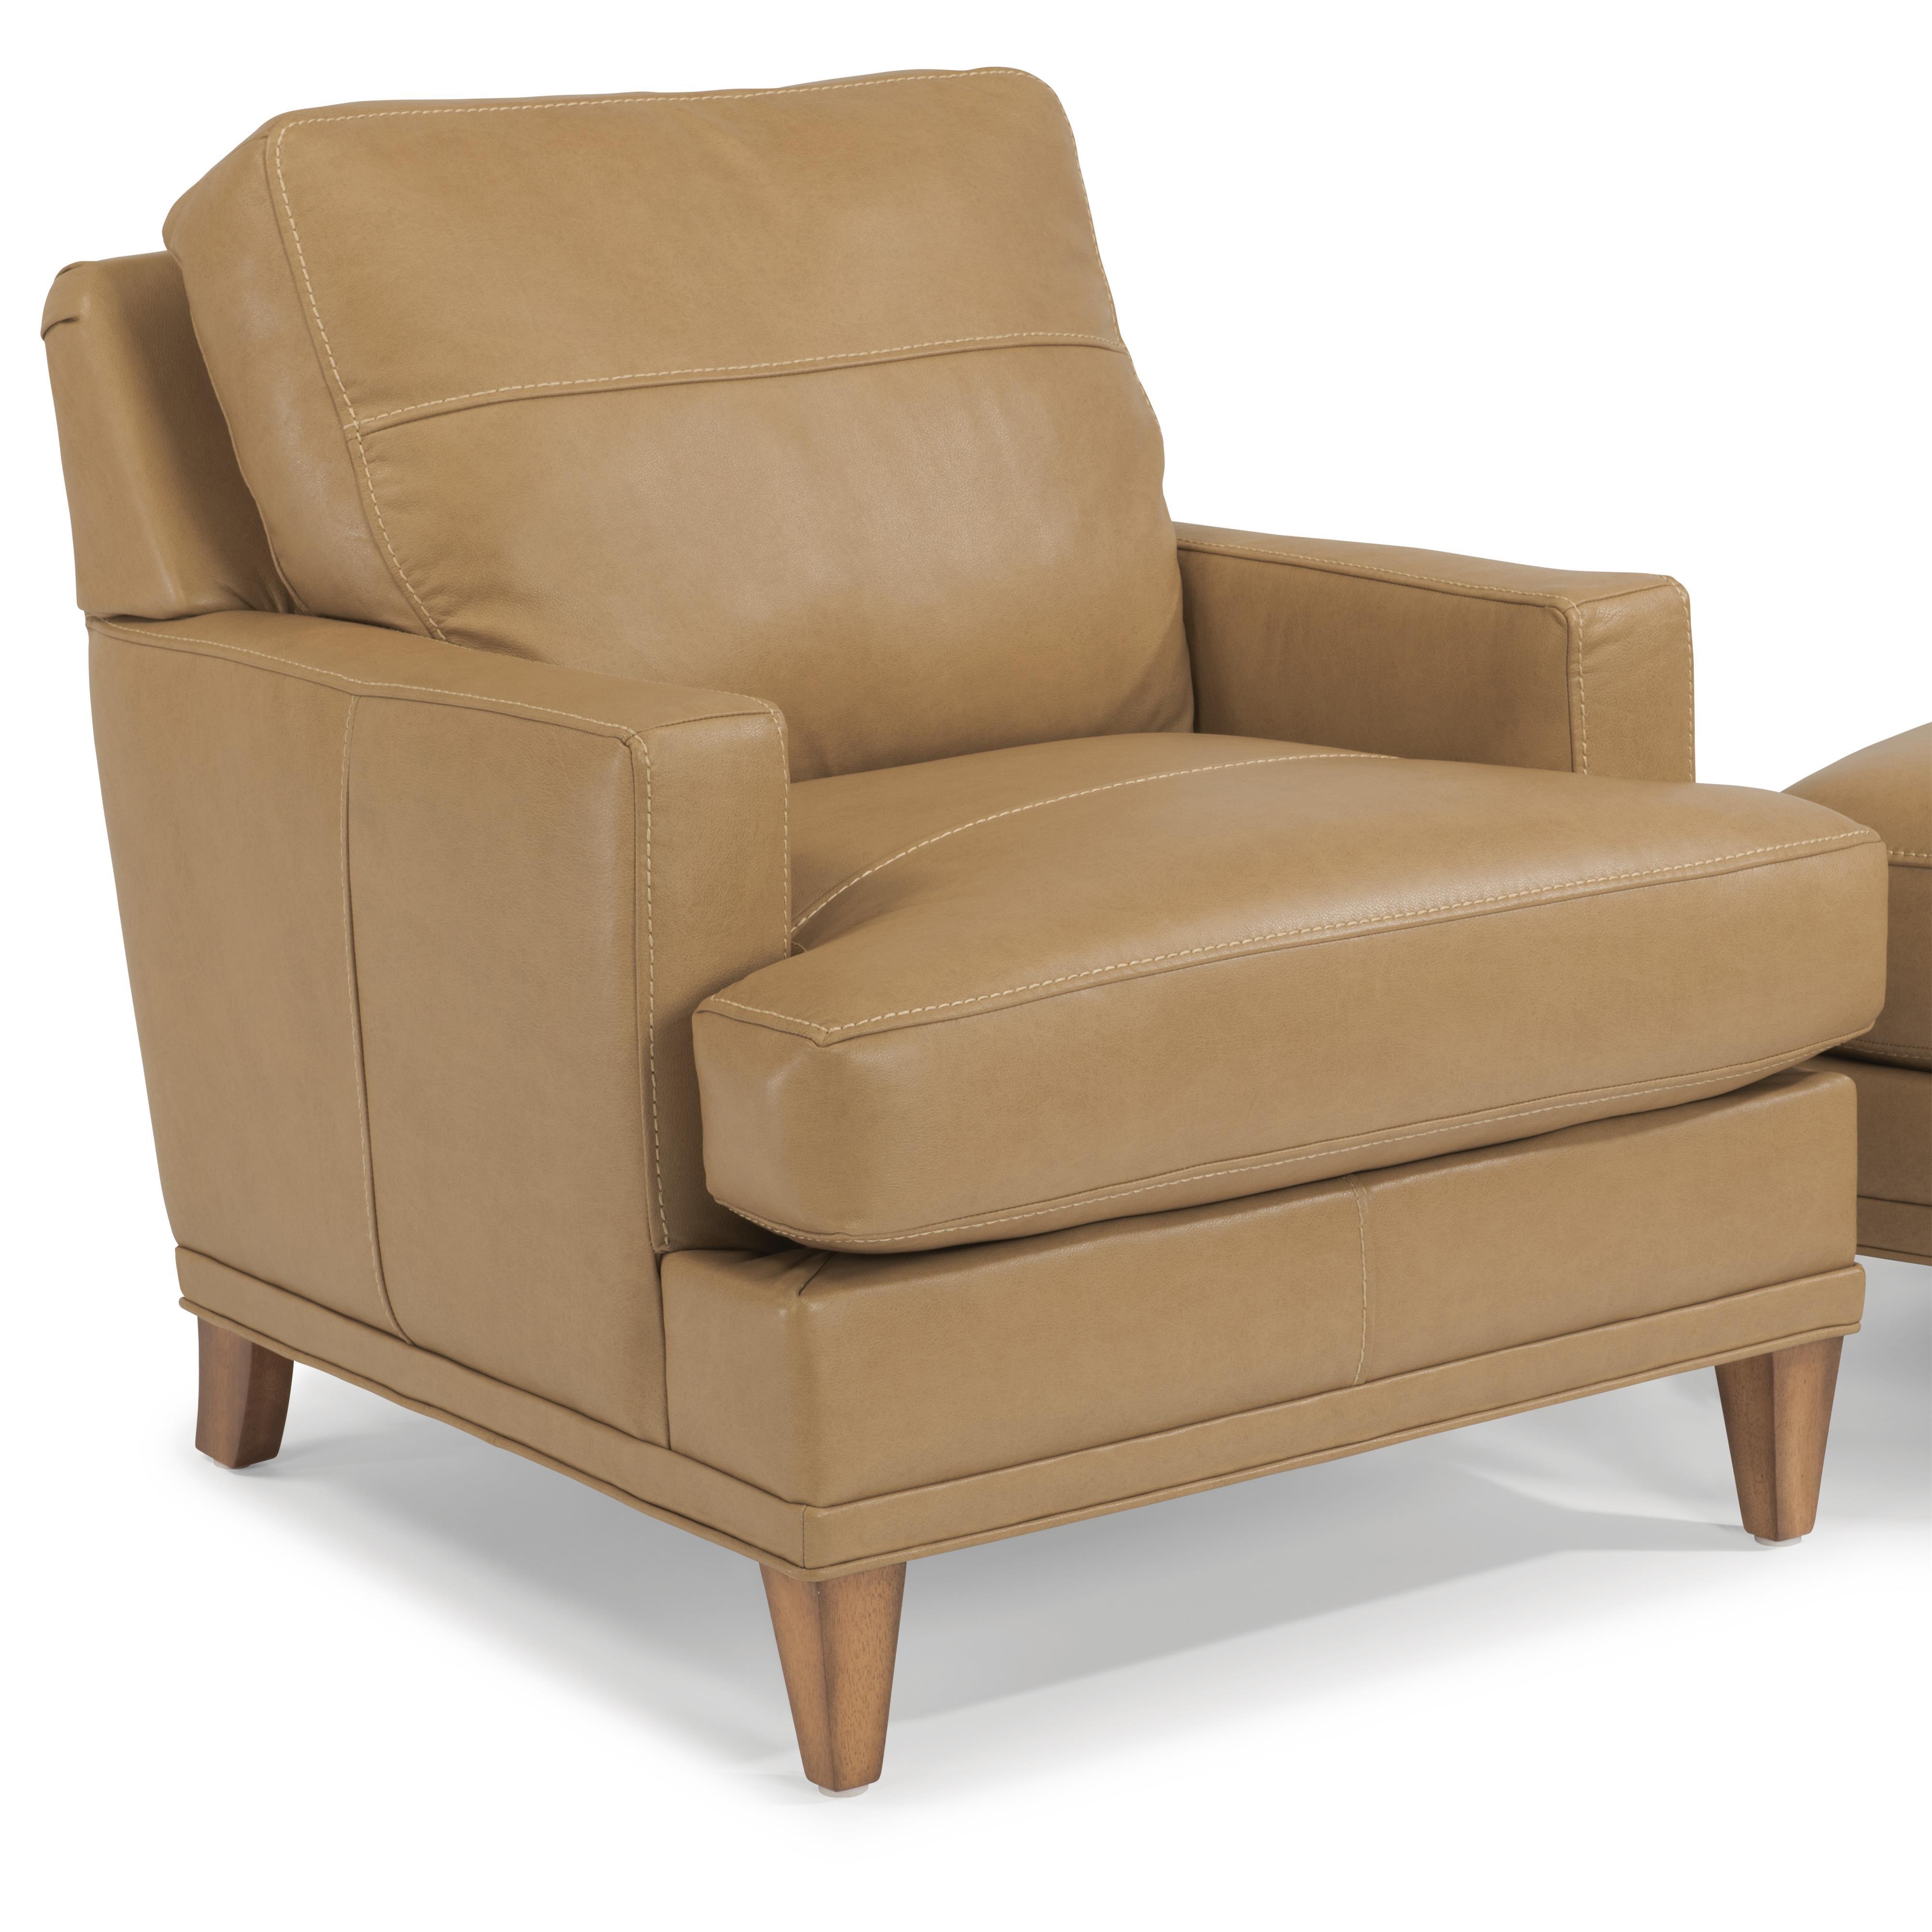 Flexsteel Ocean Chair (No Nails) - Item Number: B3368-10-174-80